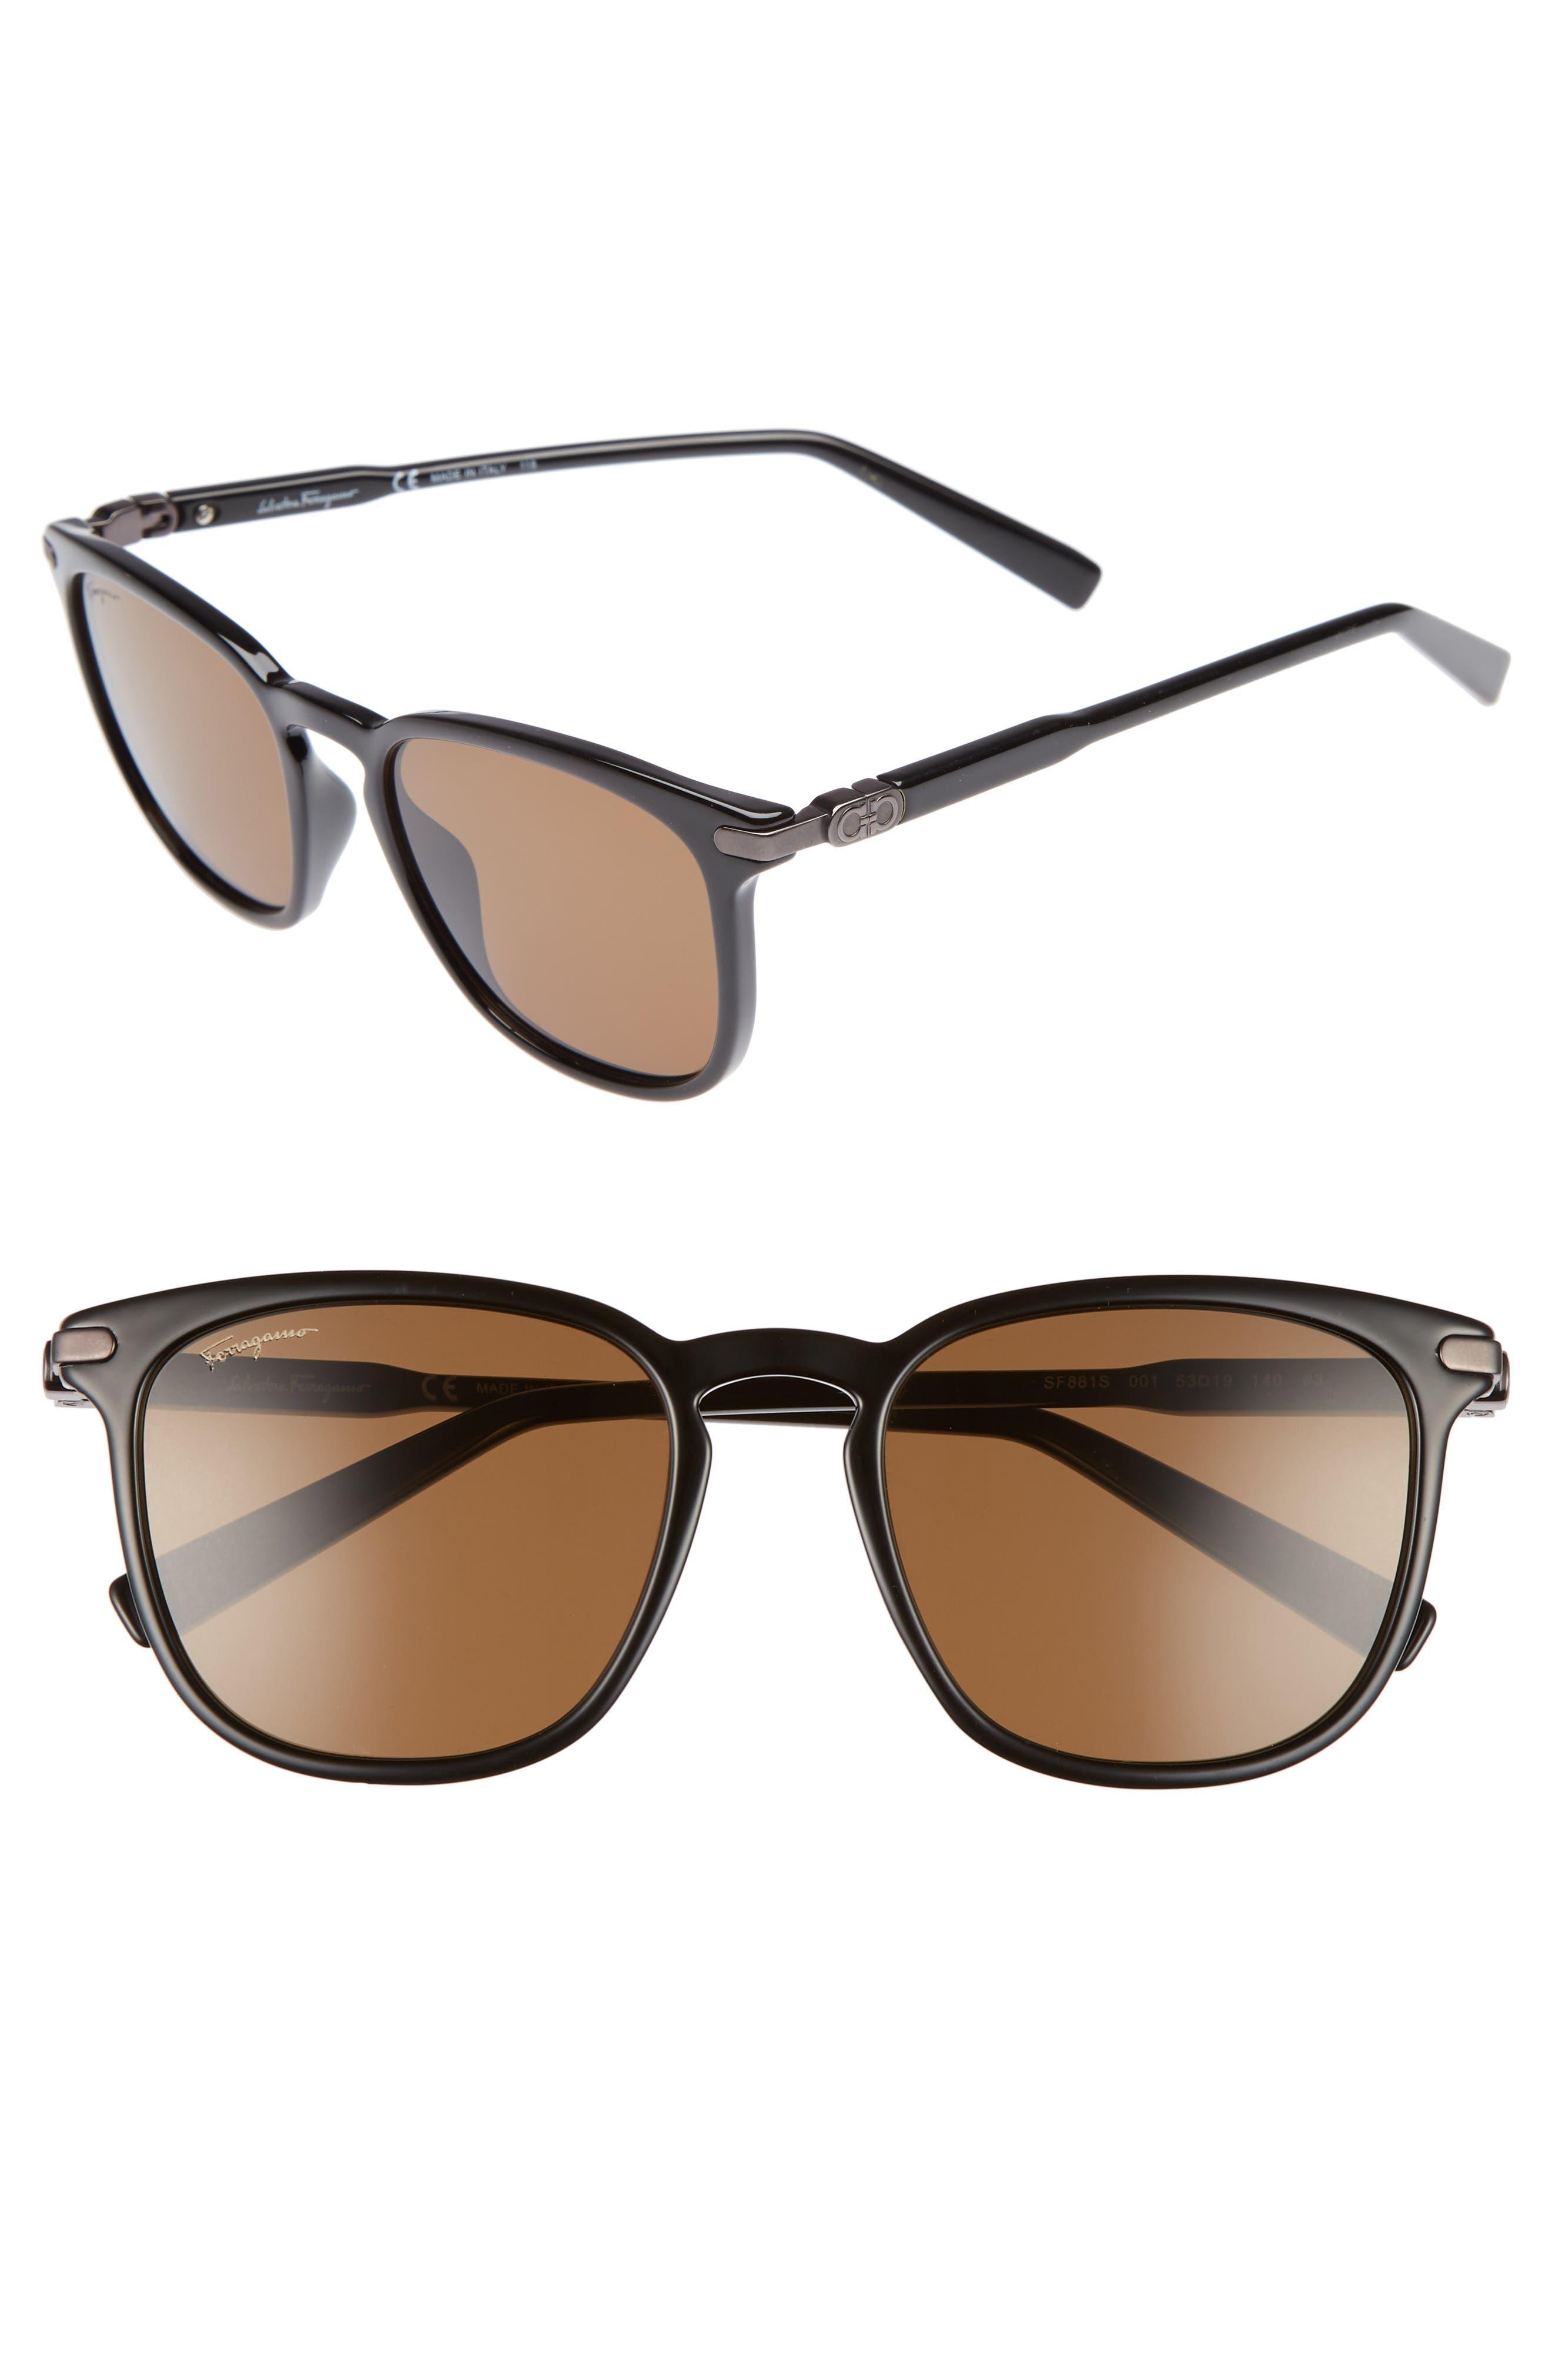 Double Gancio 53mm Sunglasses,                         Main,                         color, BLACK